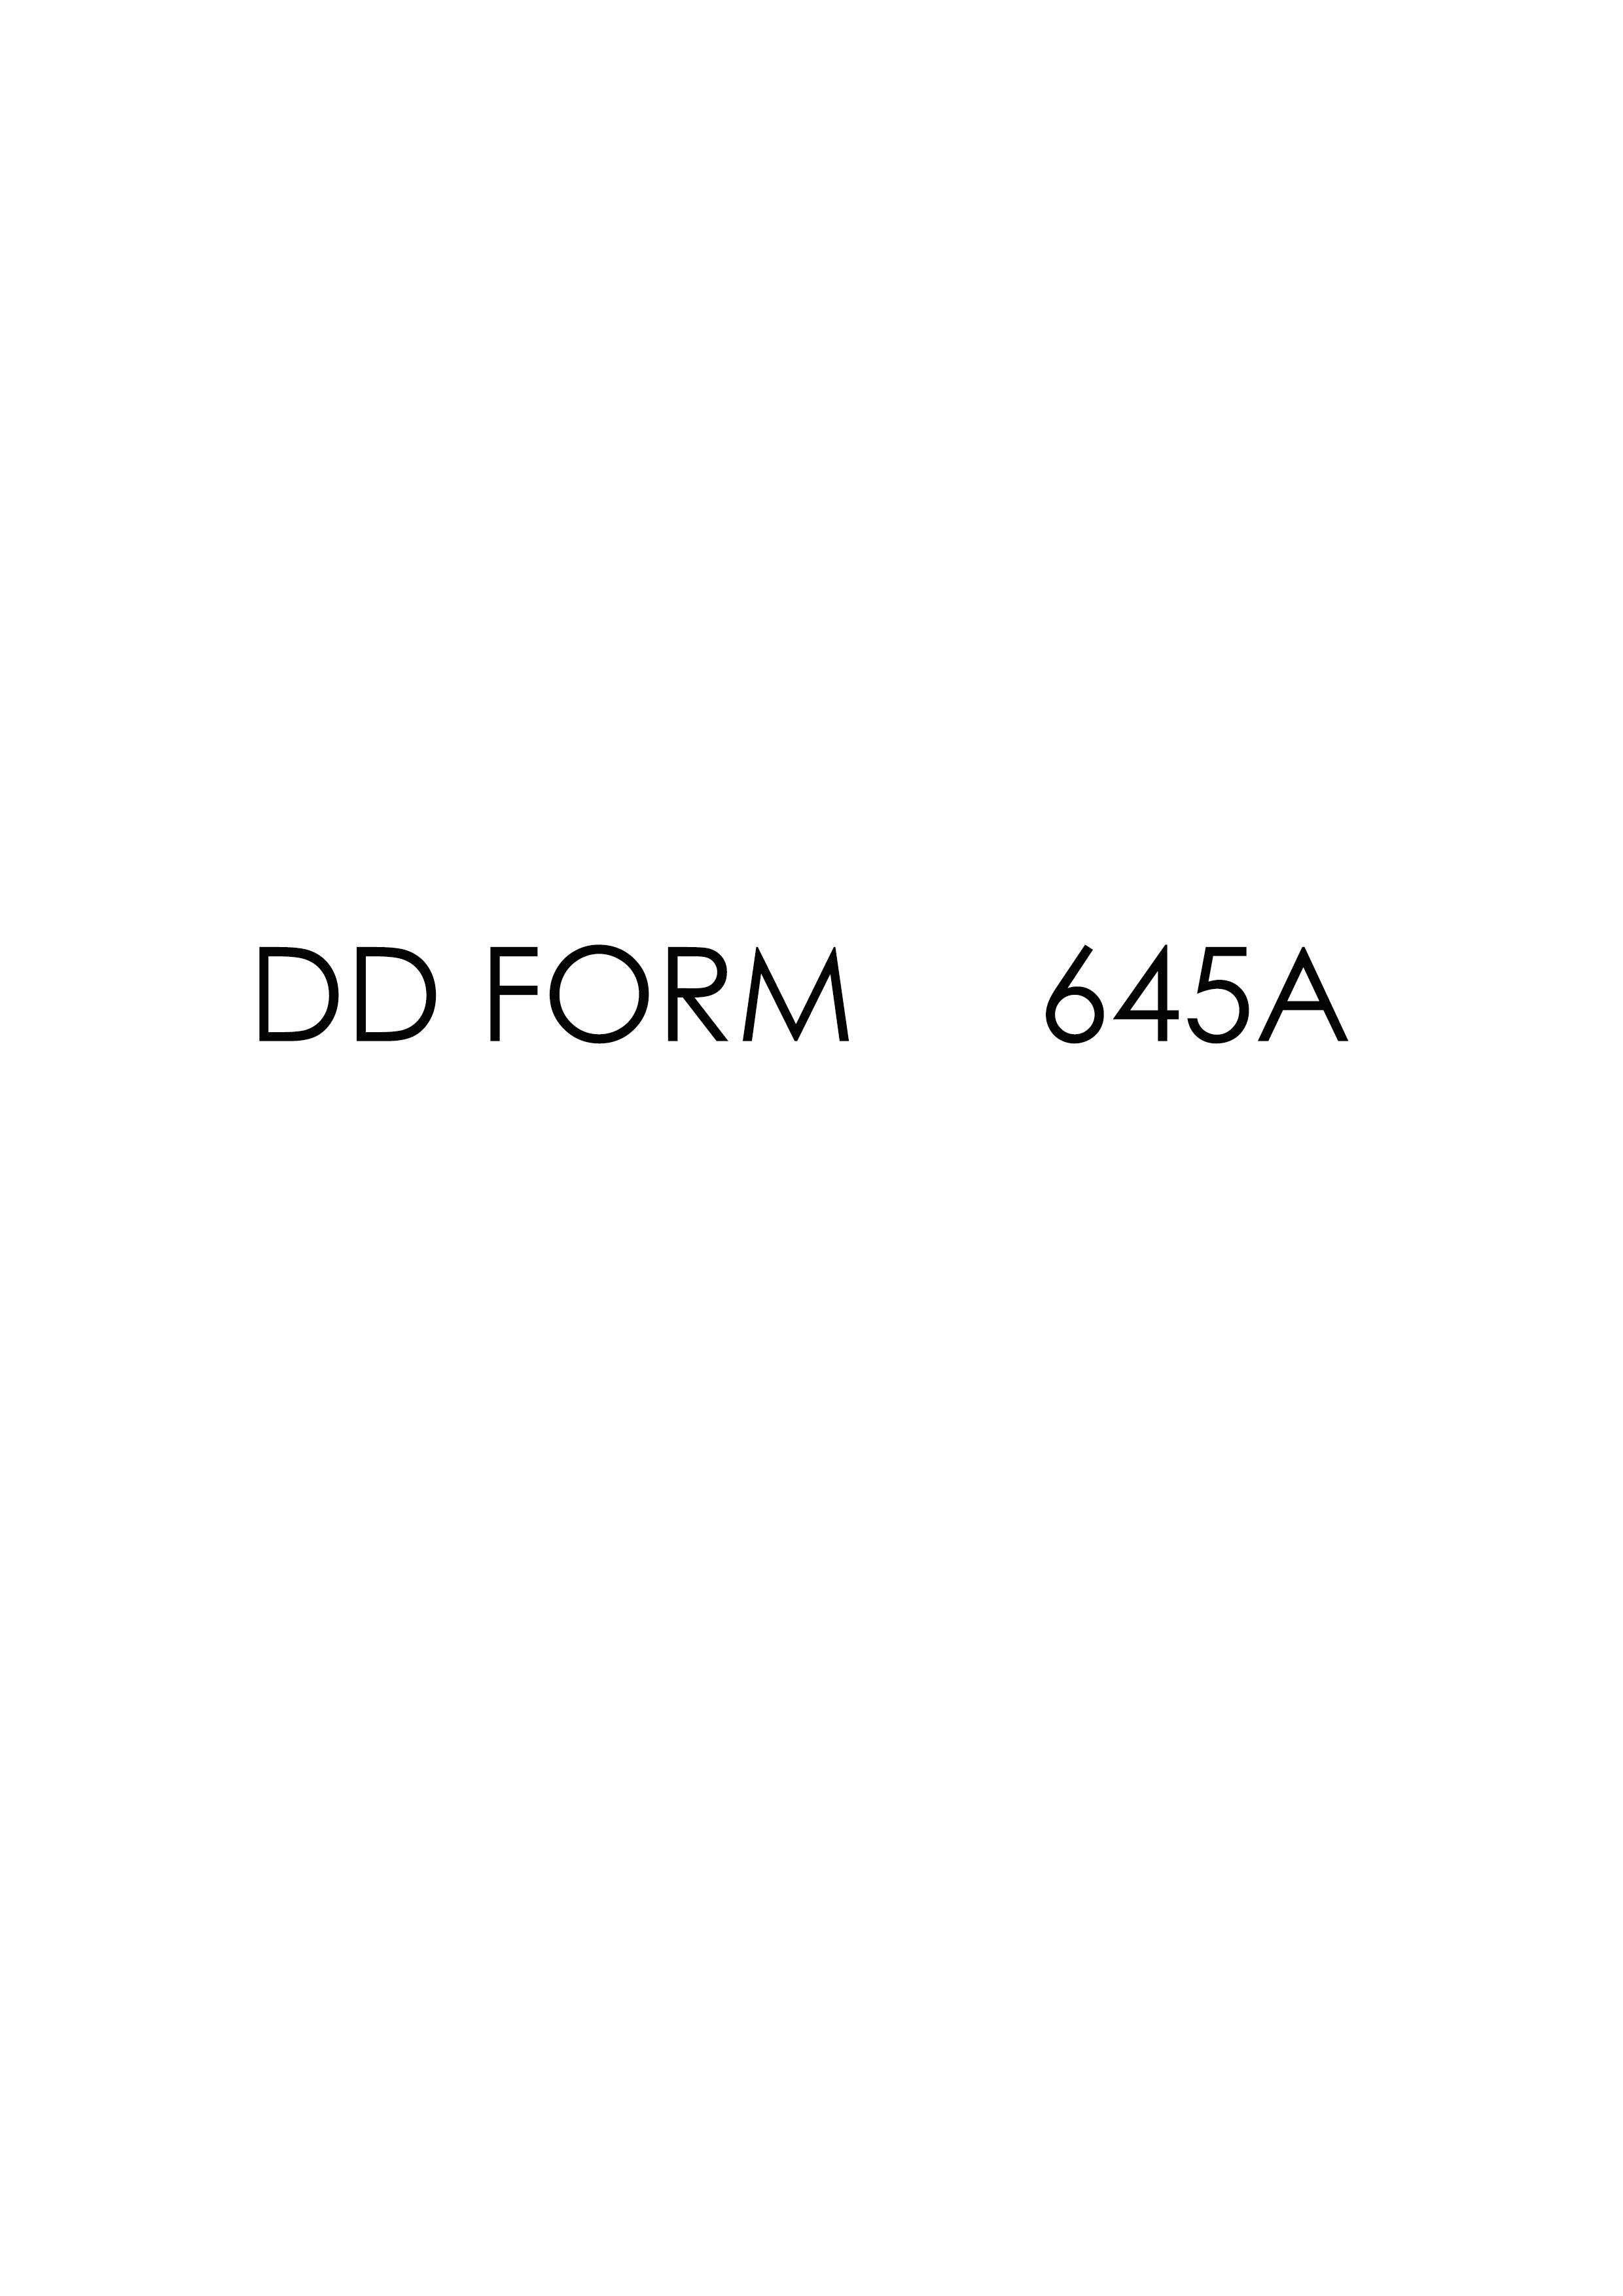 Download dd Form 645A Free